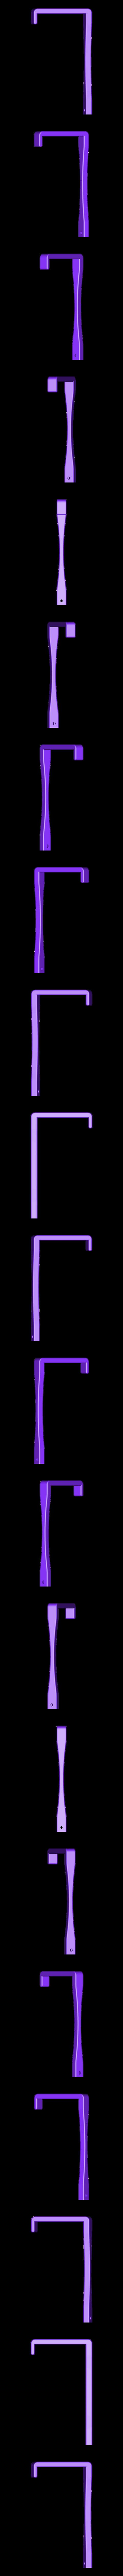 Attache.STL Download free STL file Shower shampoo holder • 3D printable template, CedricRoy